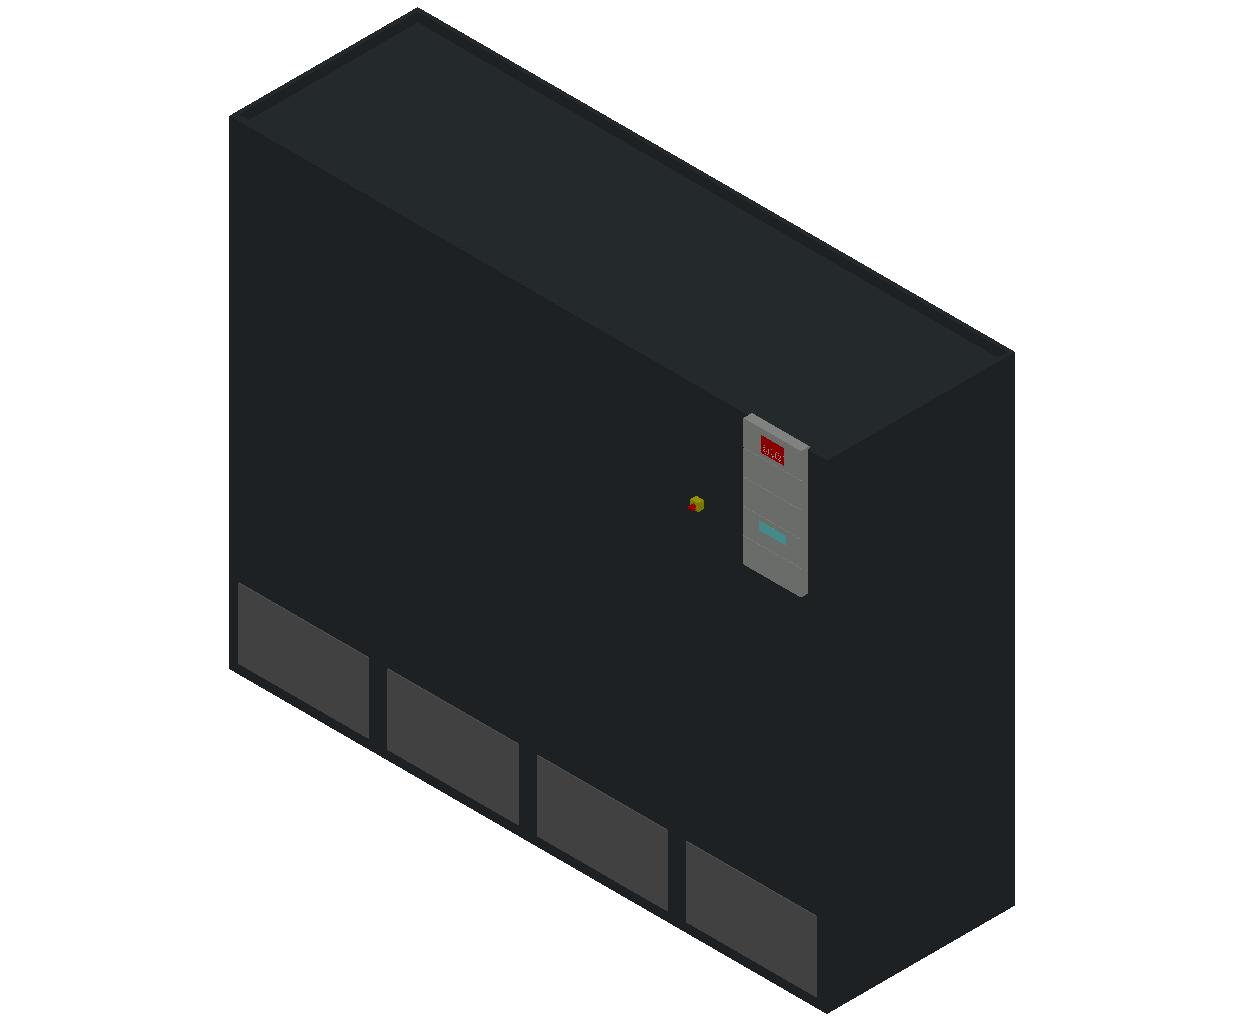 HC_Air Conditioner_Indoor Unit_MEPcontent_STULZ_CyberAir 3PRO_ASR_Dual Circuit A_ASR_1252_A_INT-EN.dwg